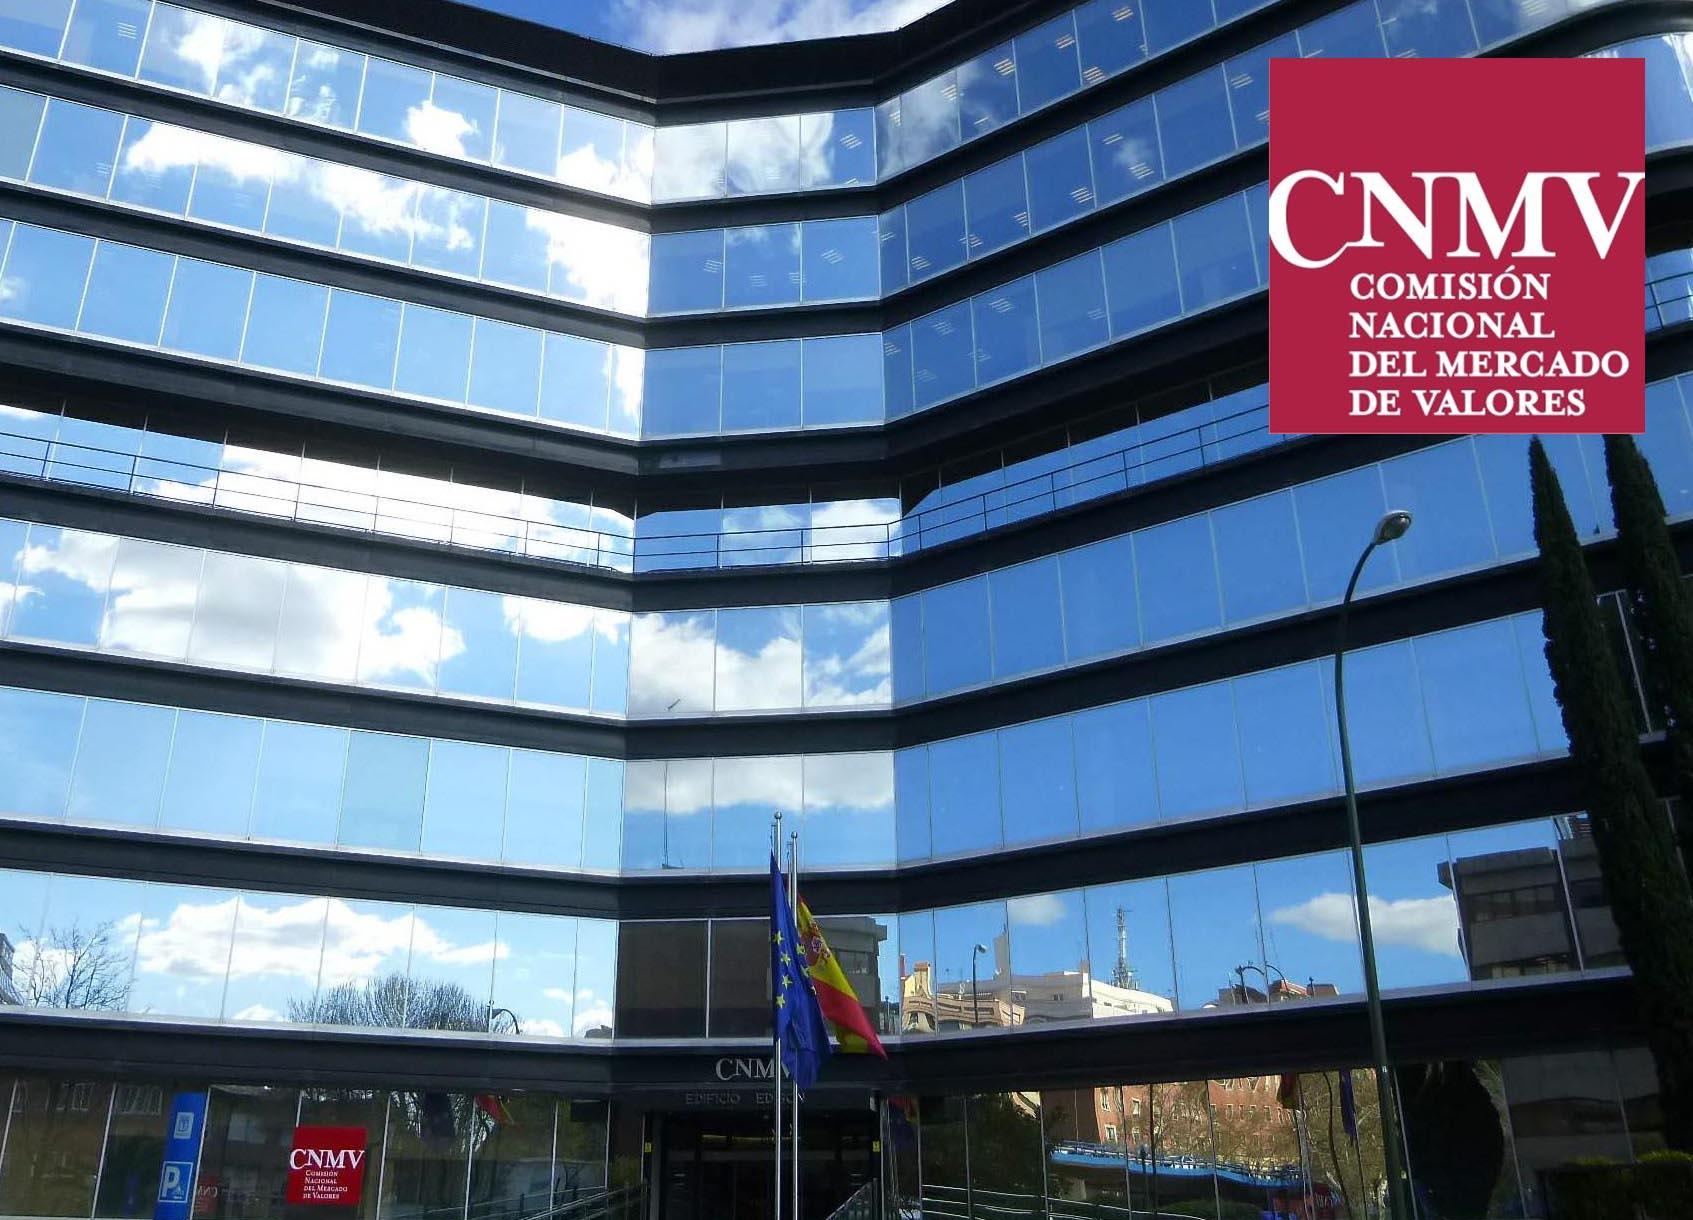 Comisión Nacional del Mercado de Valores comunicación 1 Criterios de la CNMV sobre difusión de información relevante por la prensa